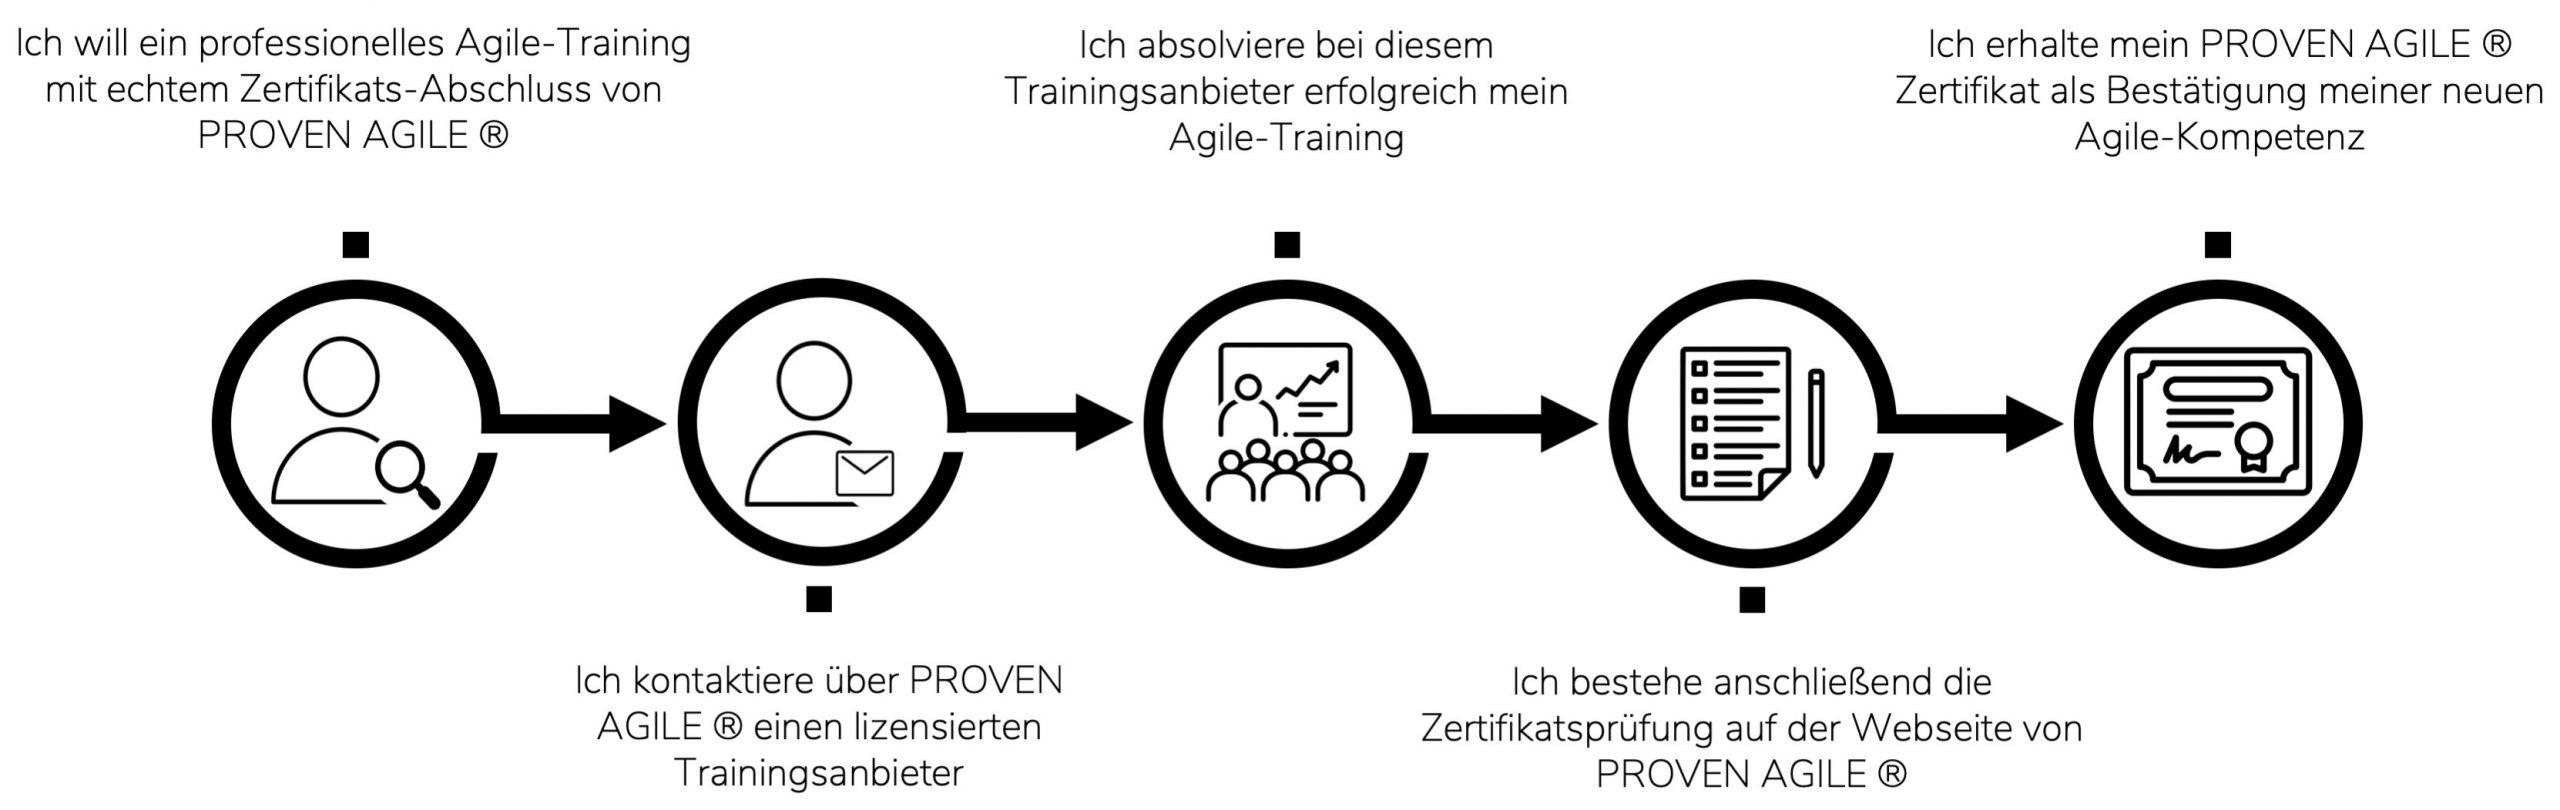 Zertifizierungsprozess - Auswahl Agiles Training - Kontakt mit Trainings-anbieter - Absolvieren Training - Zertifizierungsprüfung - Erhalt Zertifikat